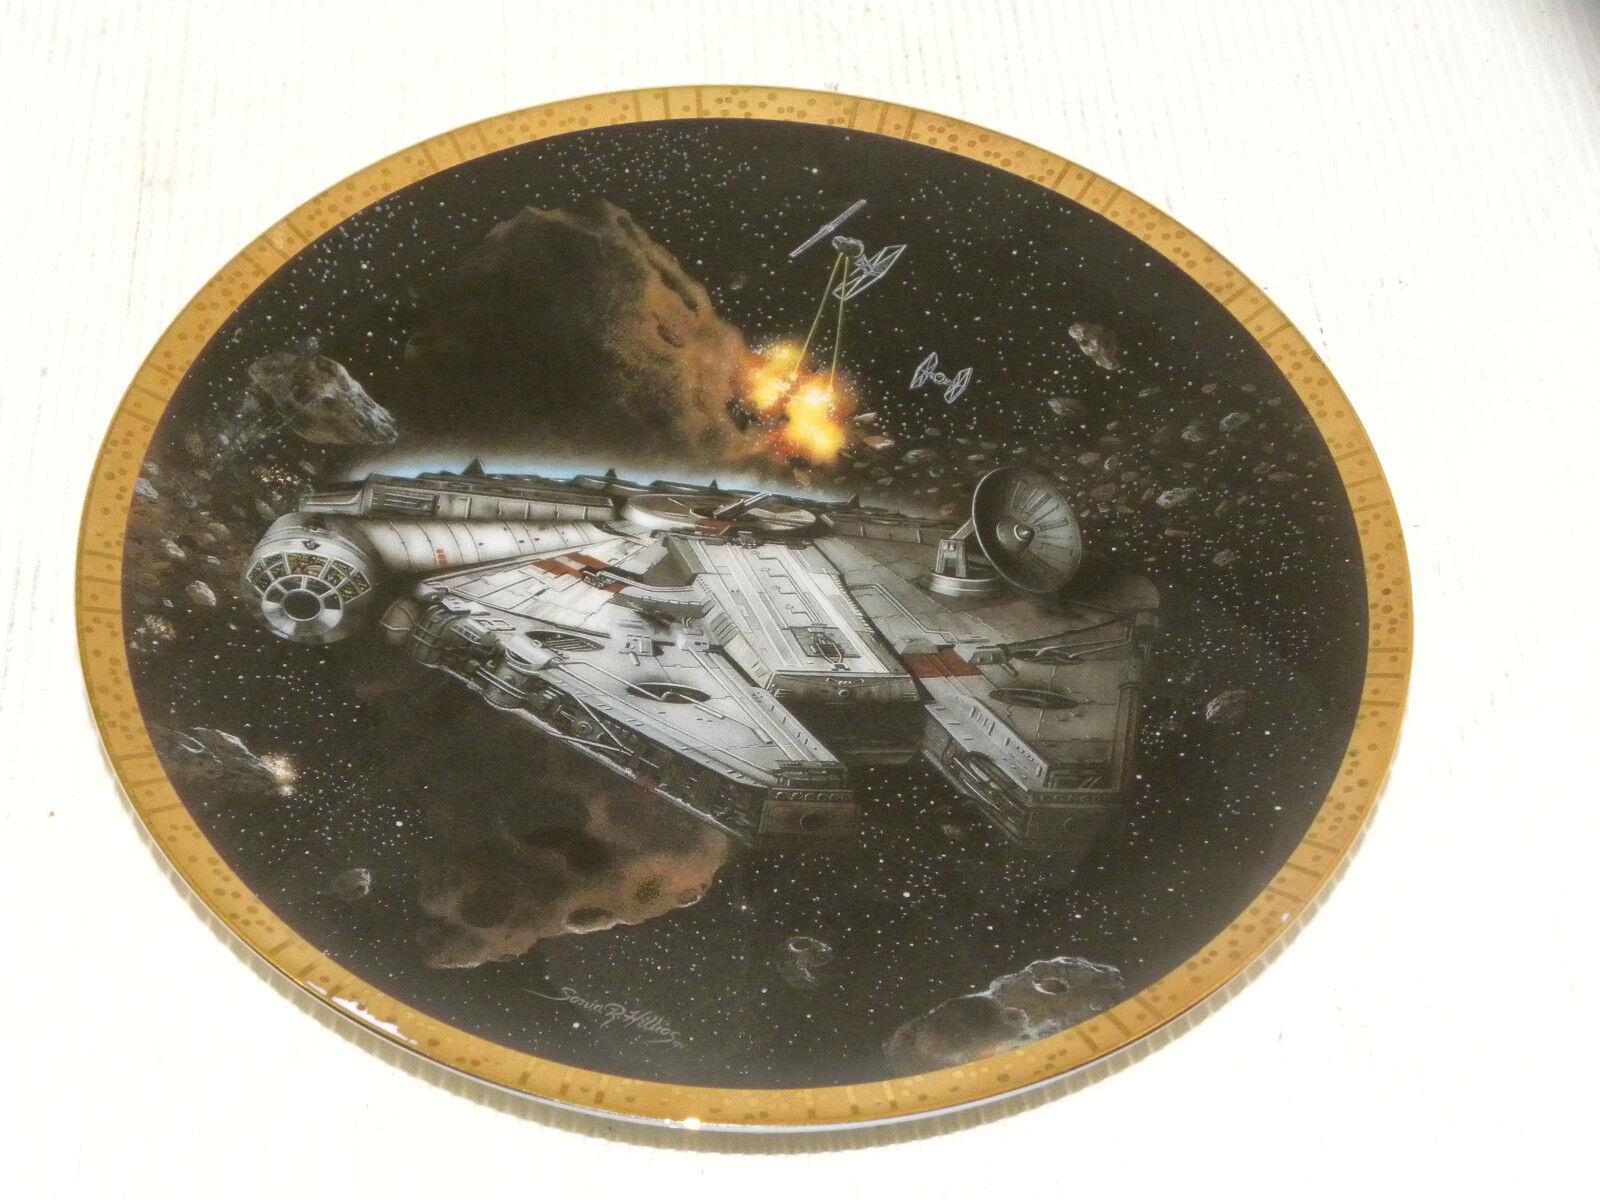 Star - wars - hamilton sammlung 1995 millennium - falken.slave - i - star zerstörer